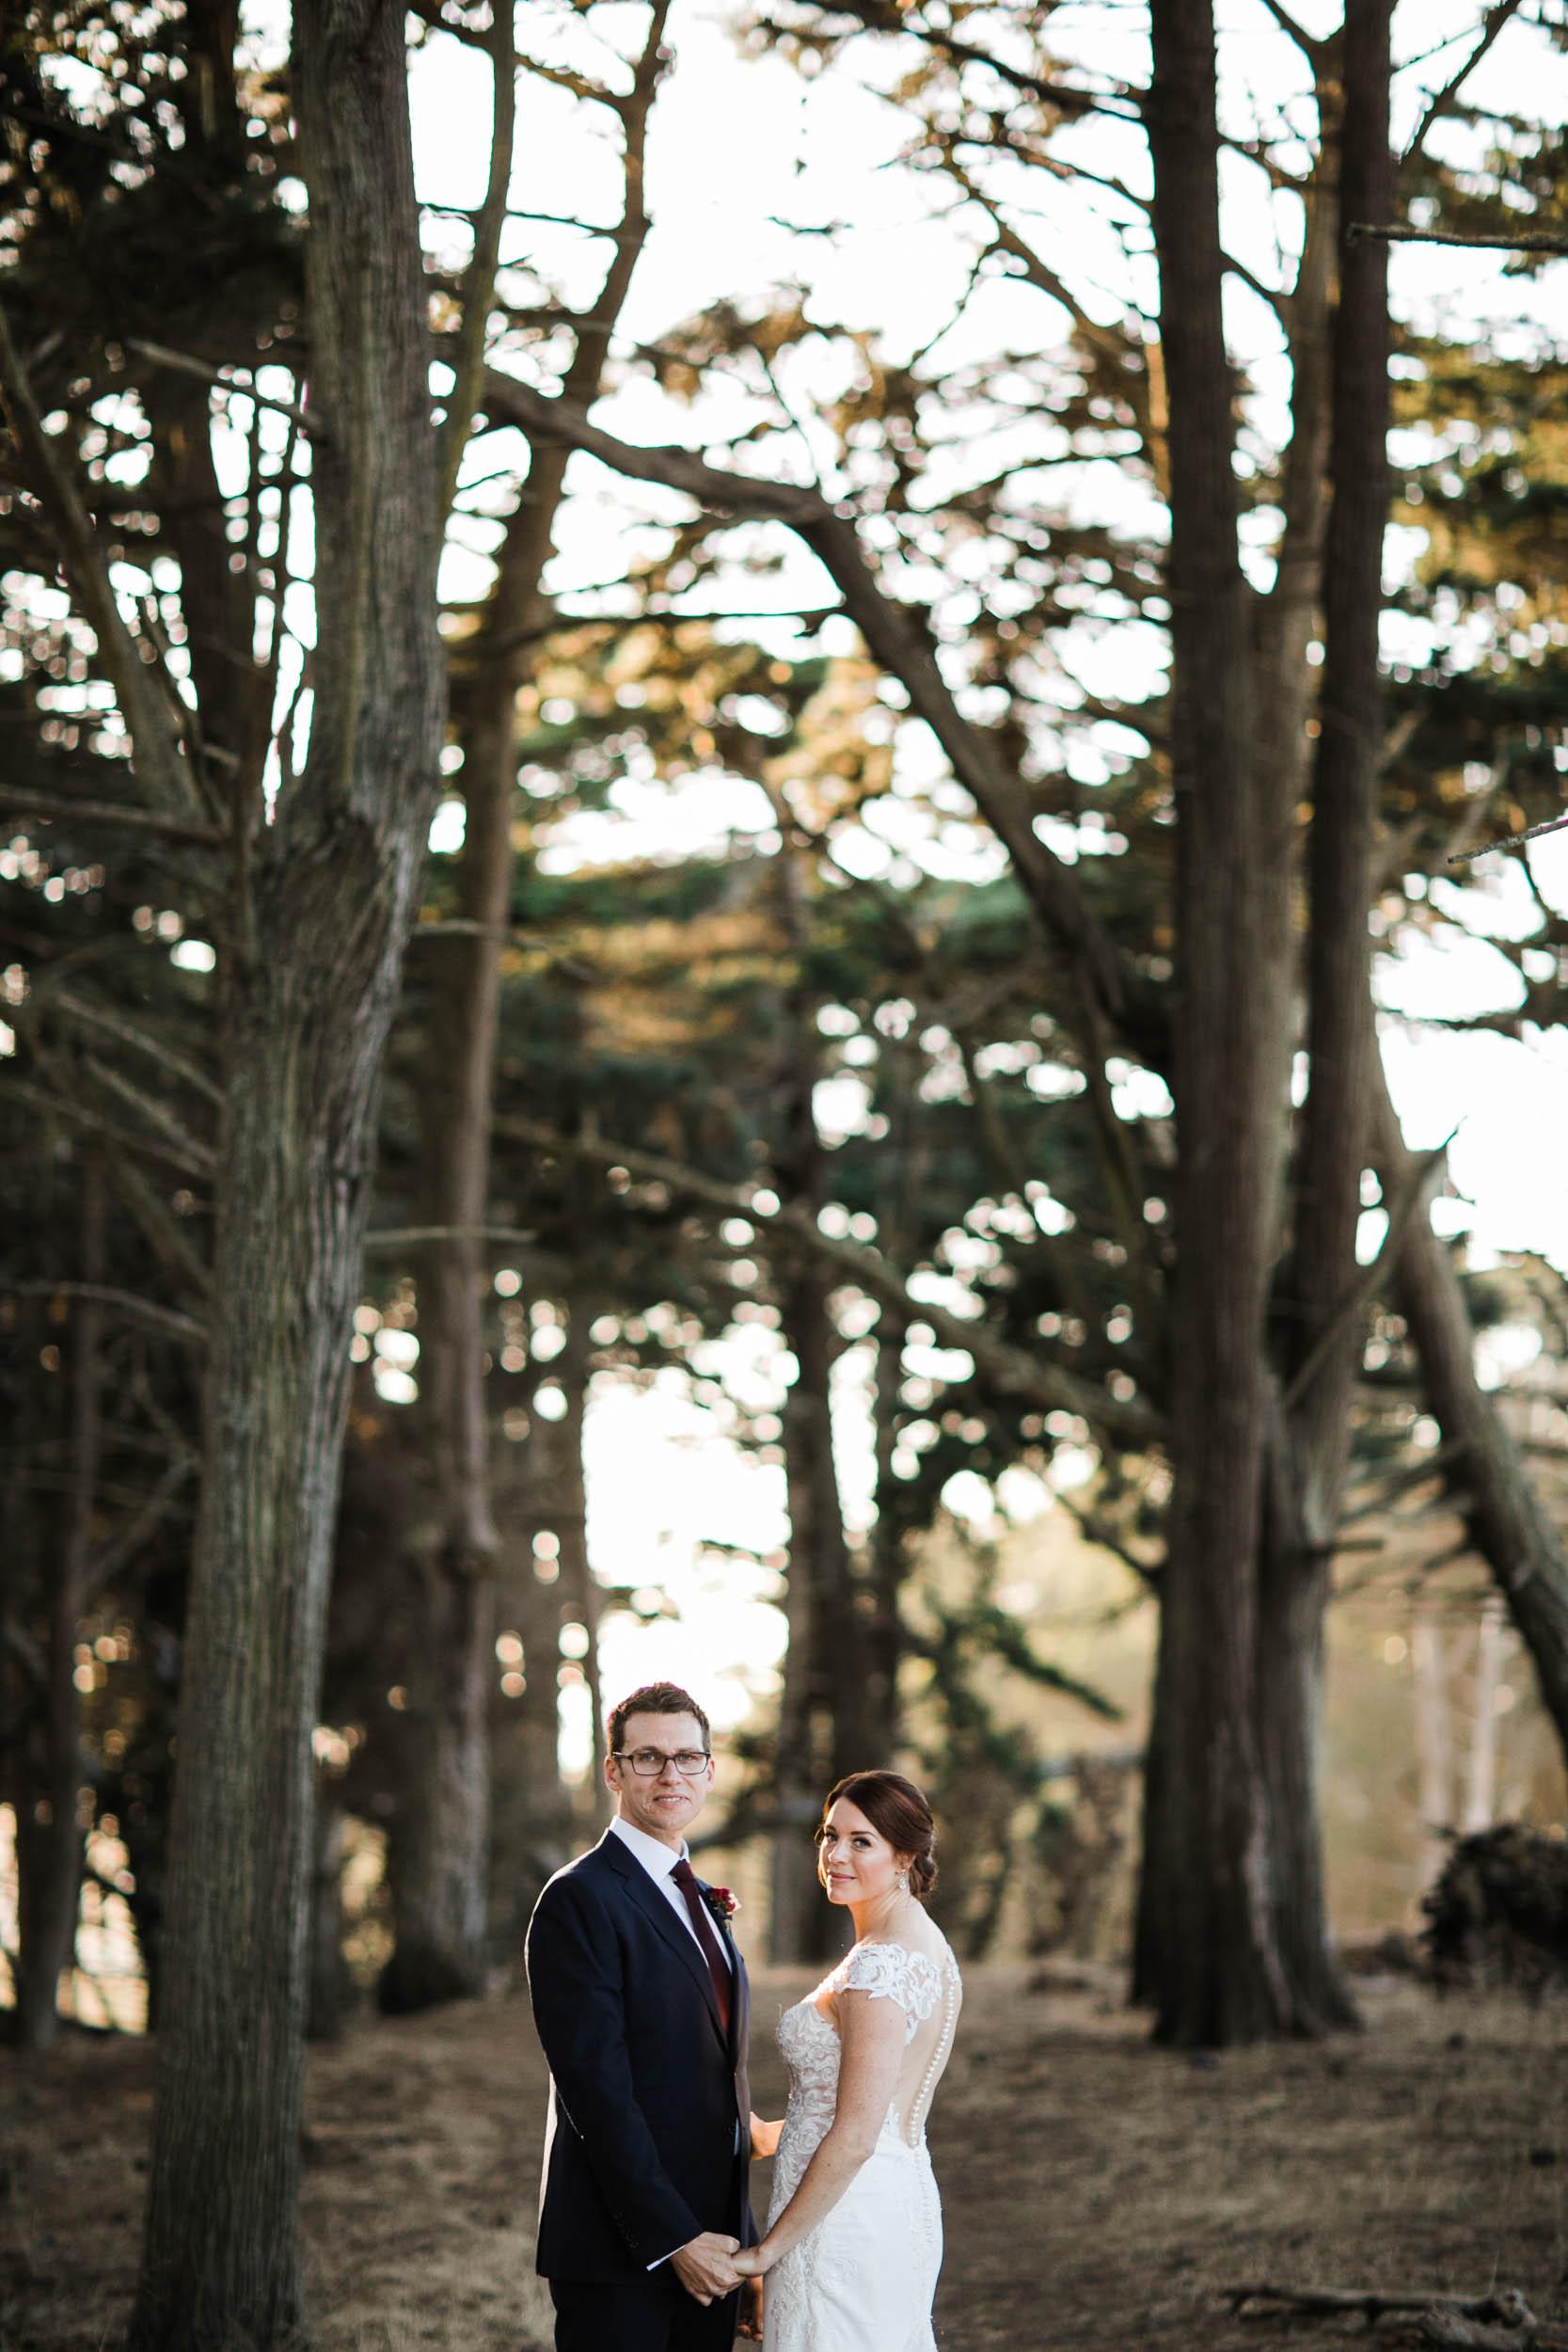 102117_C+D_Golden Gate Club Wedding_Buena Lane Photography_1120ER.jpg